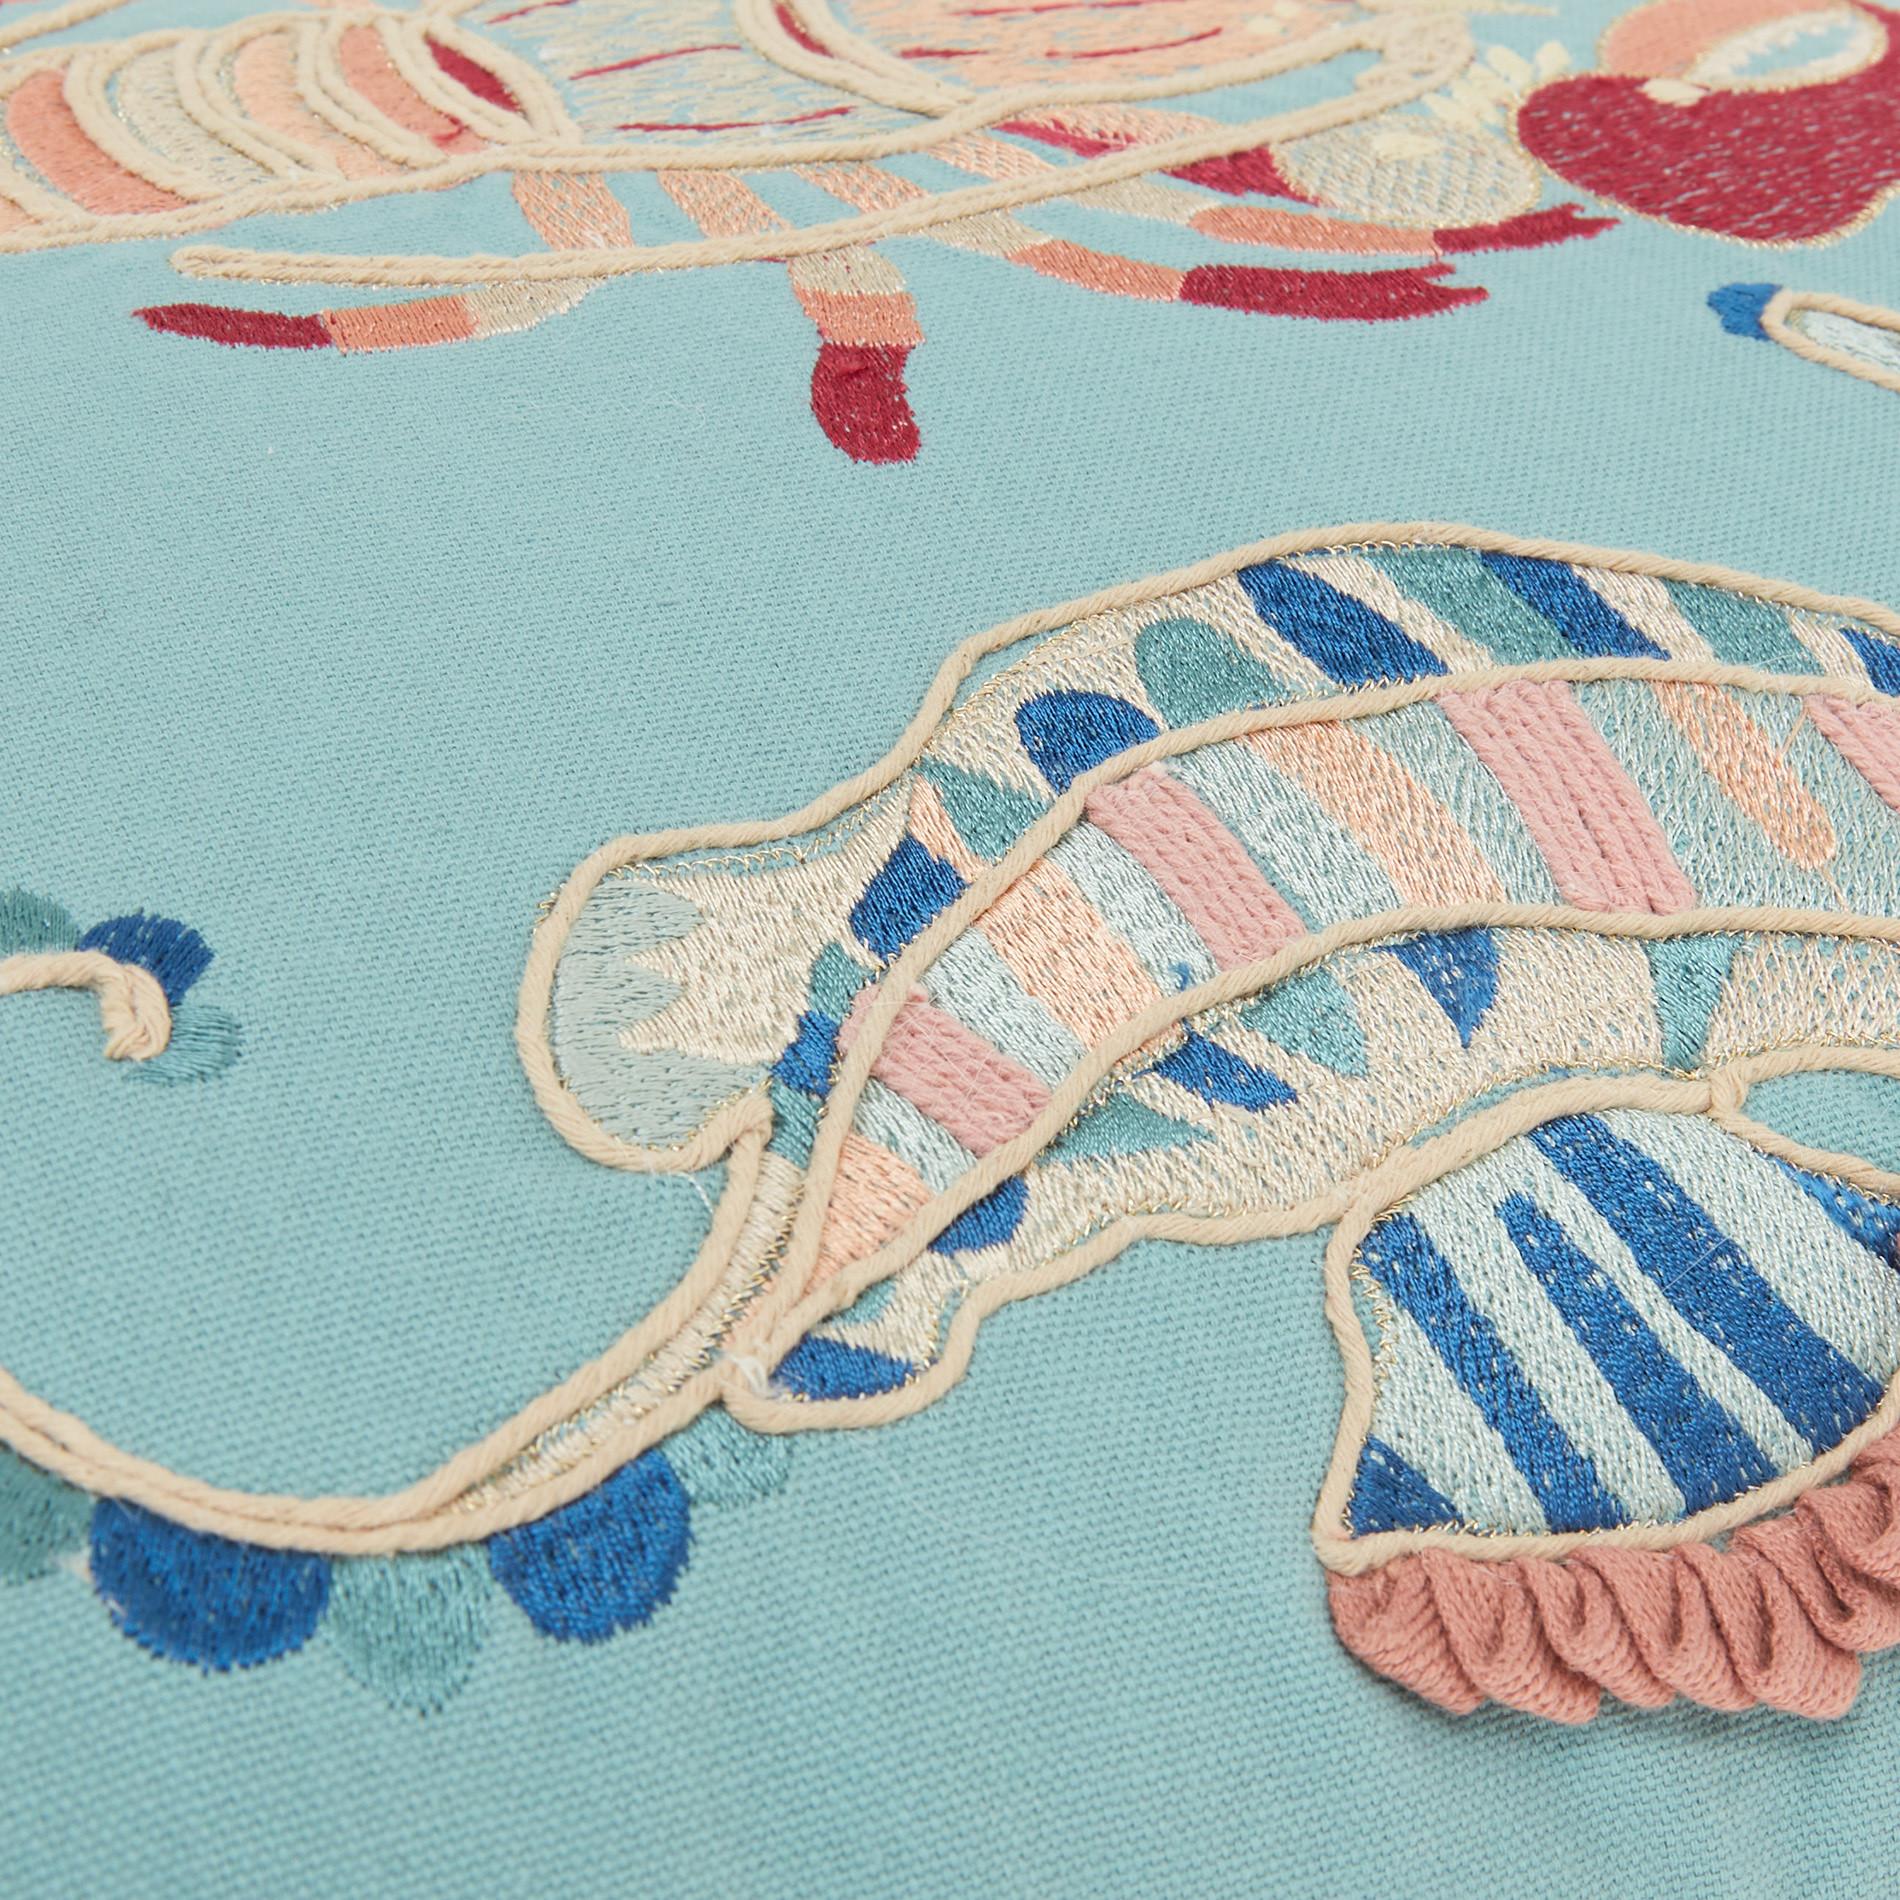 Cuscino ricamo animali marini 45x45cm, Azzurro, large image number 3